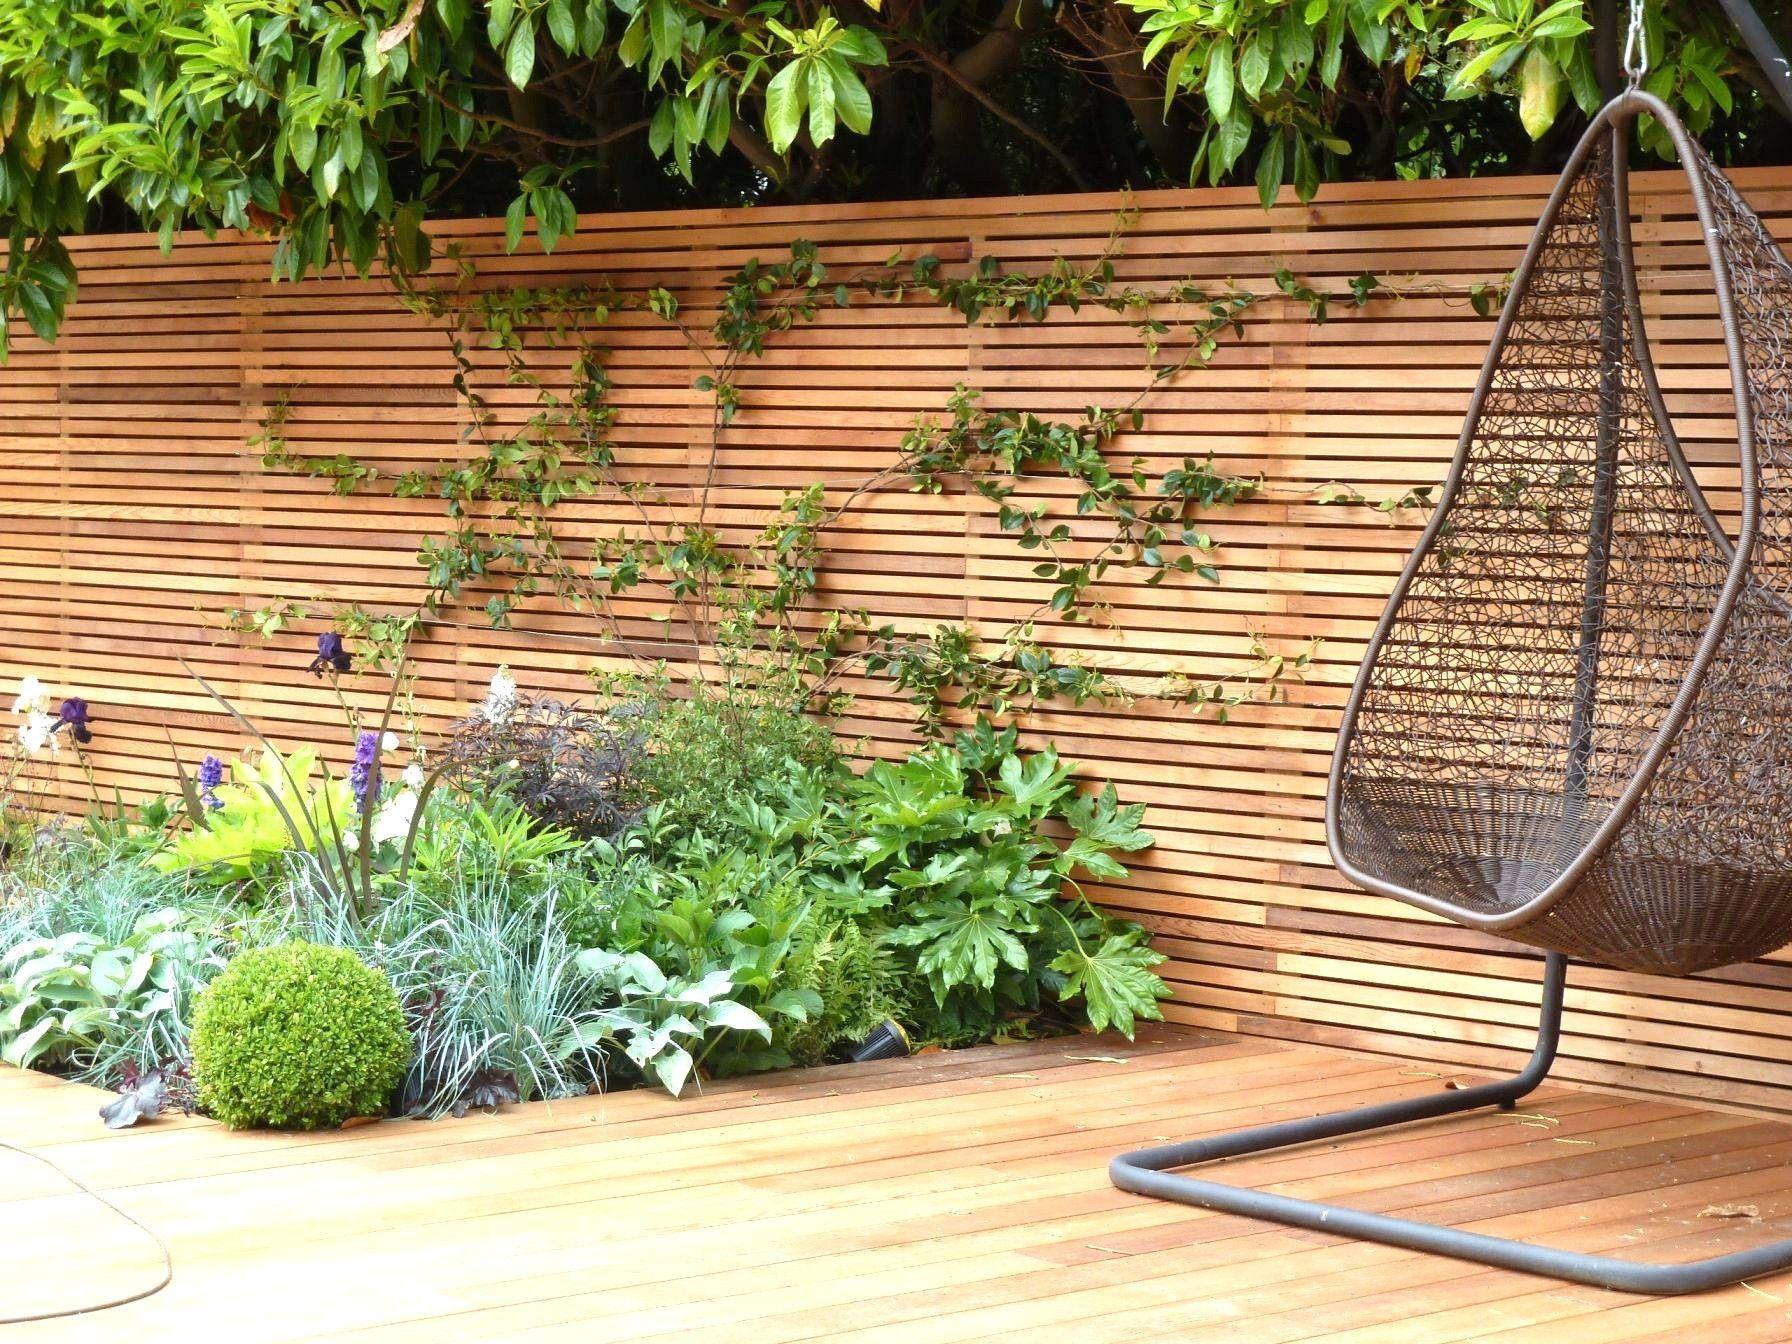 Oberteil 40 Fur Bauhaus Sichtschutz Holz Gartendesign Ideen